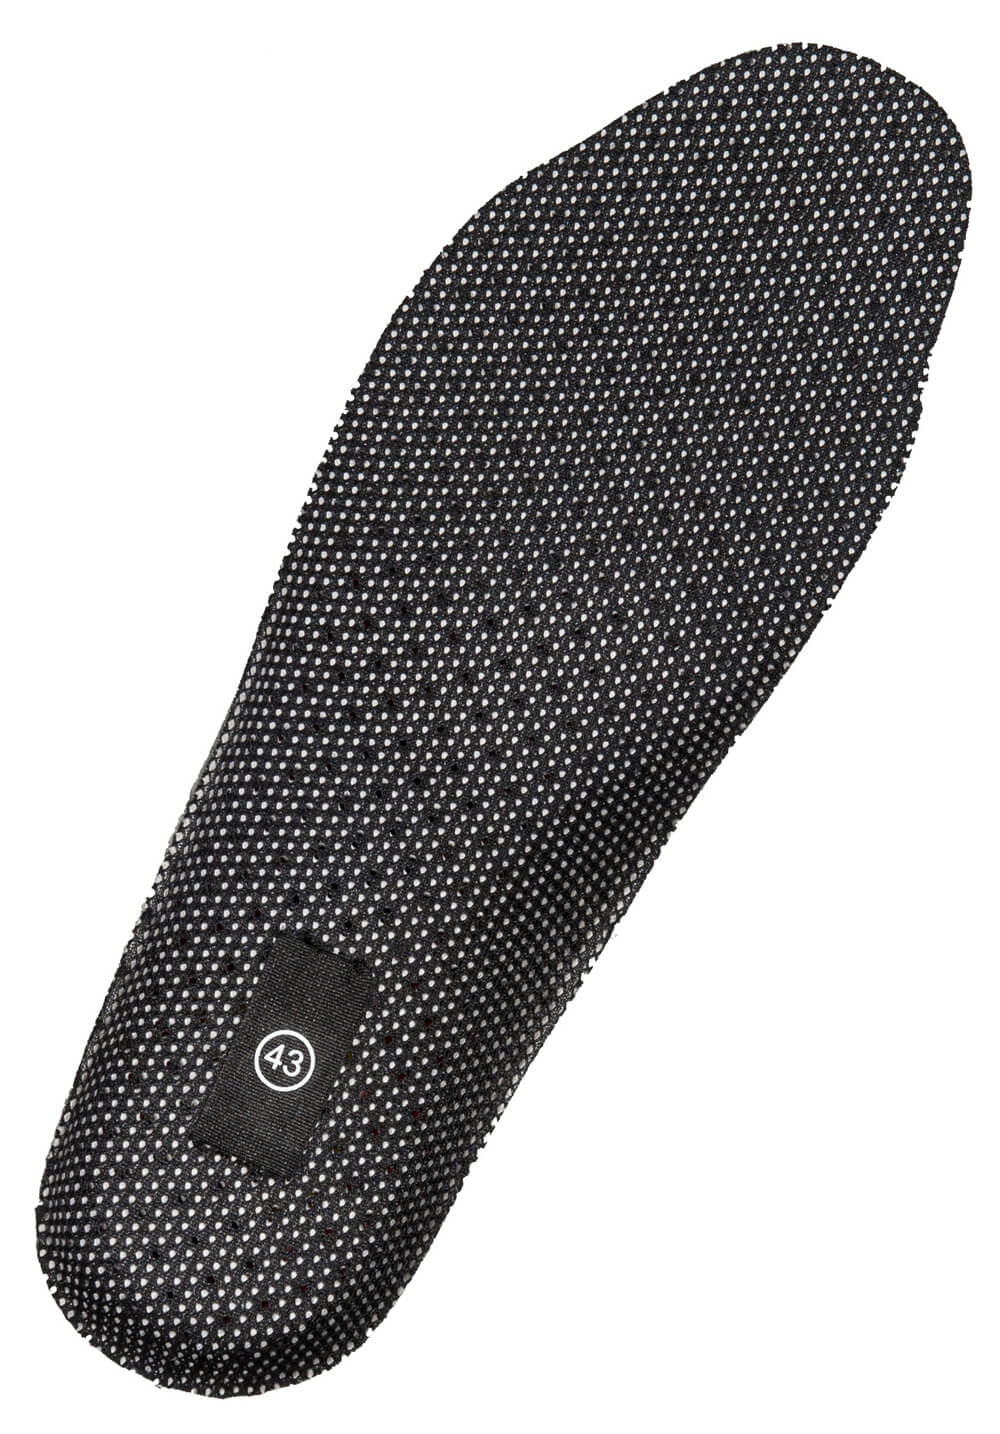 FT086-980-09 Inläggssulor - svart